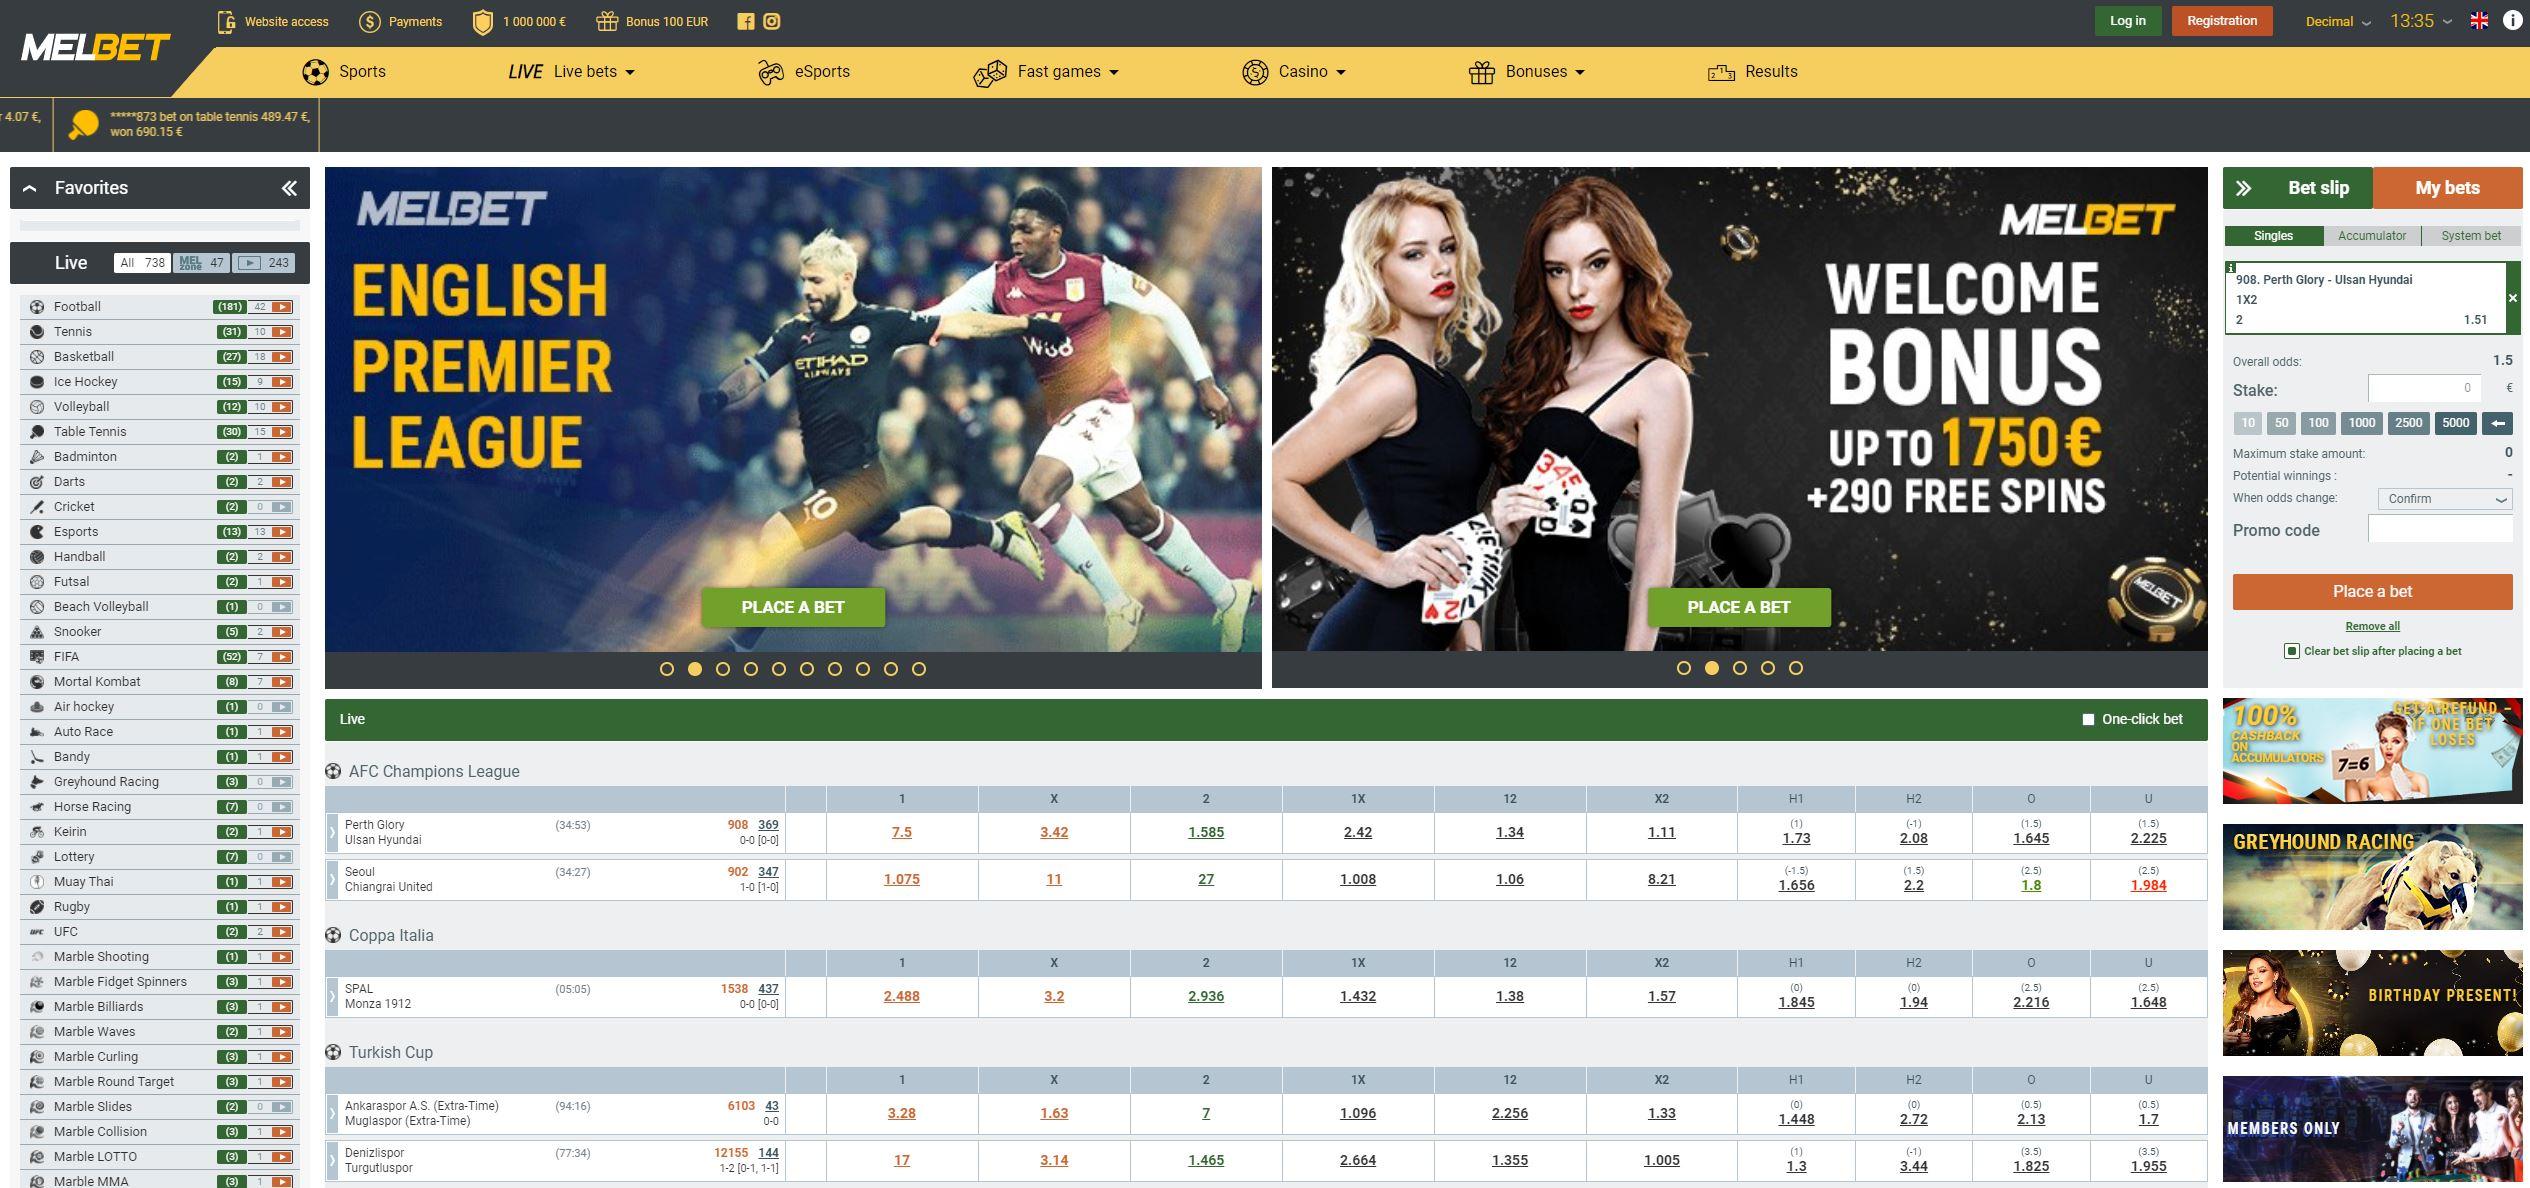 melbet bookmaker casino live mobile app mellbet